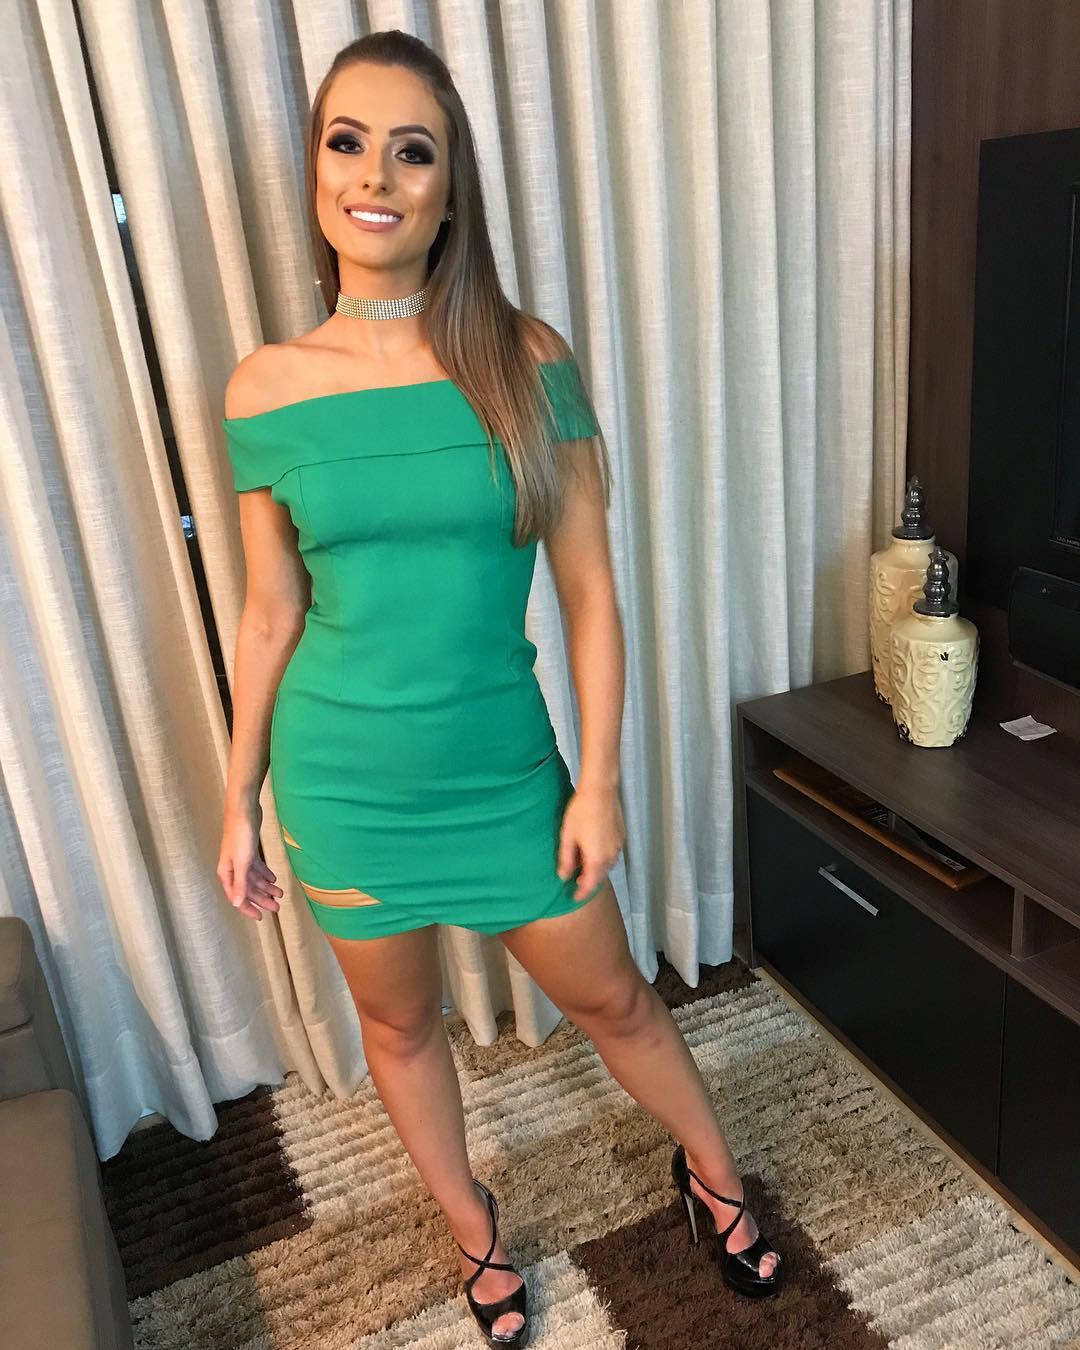 cristine boff sartor, segunda finalista de miss latinoamerica 2019. - Página 5 57411810